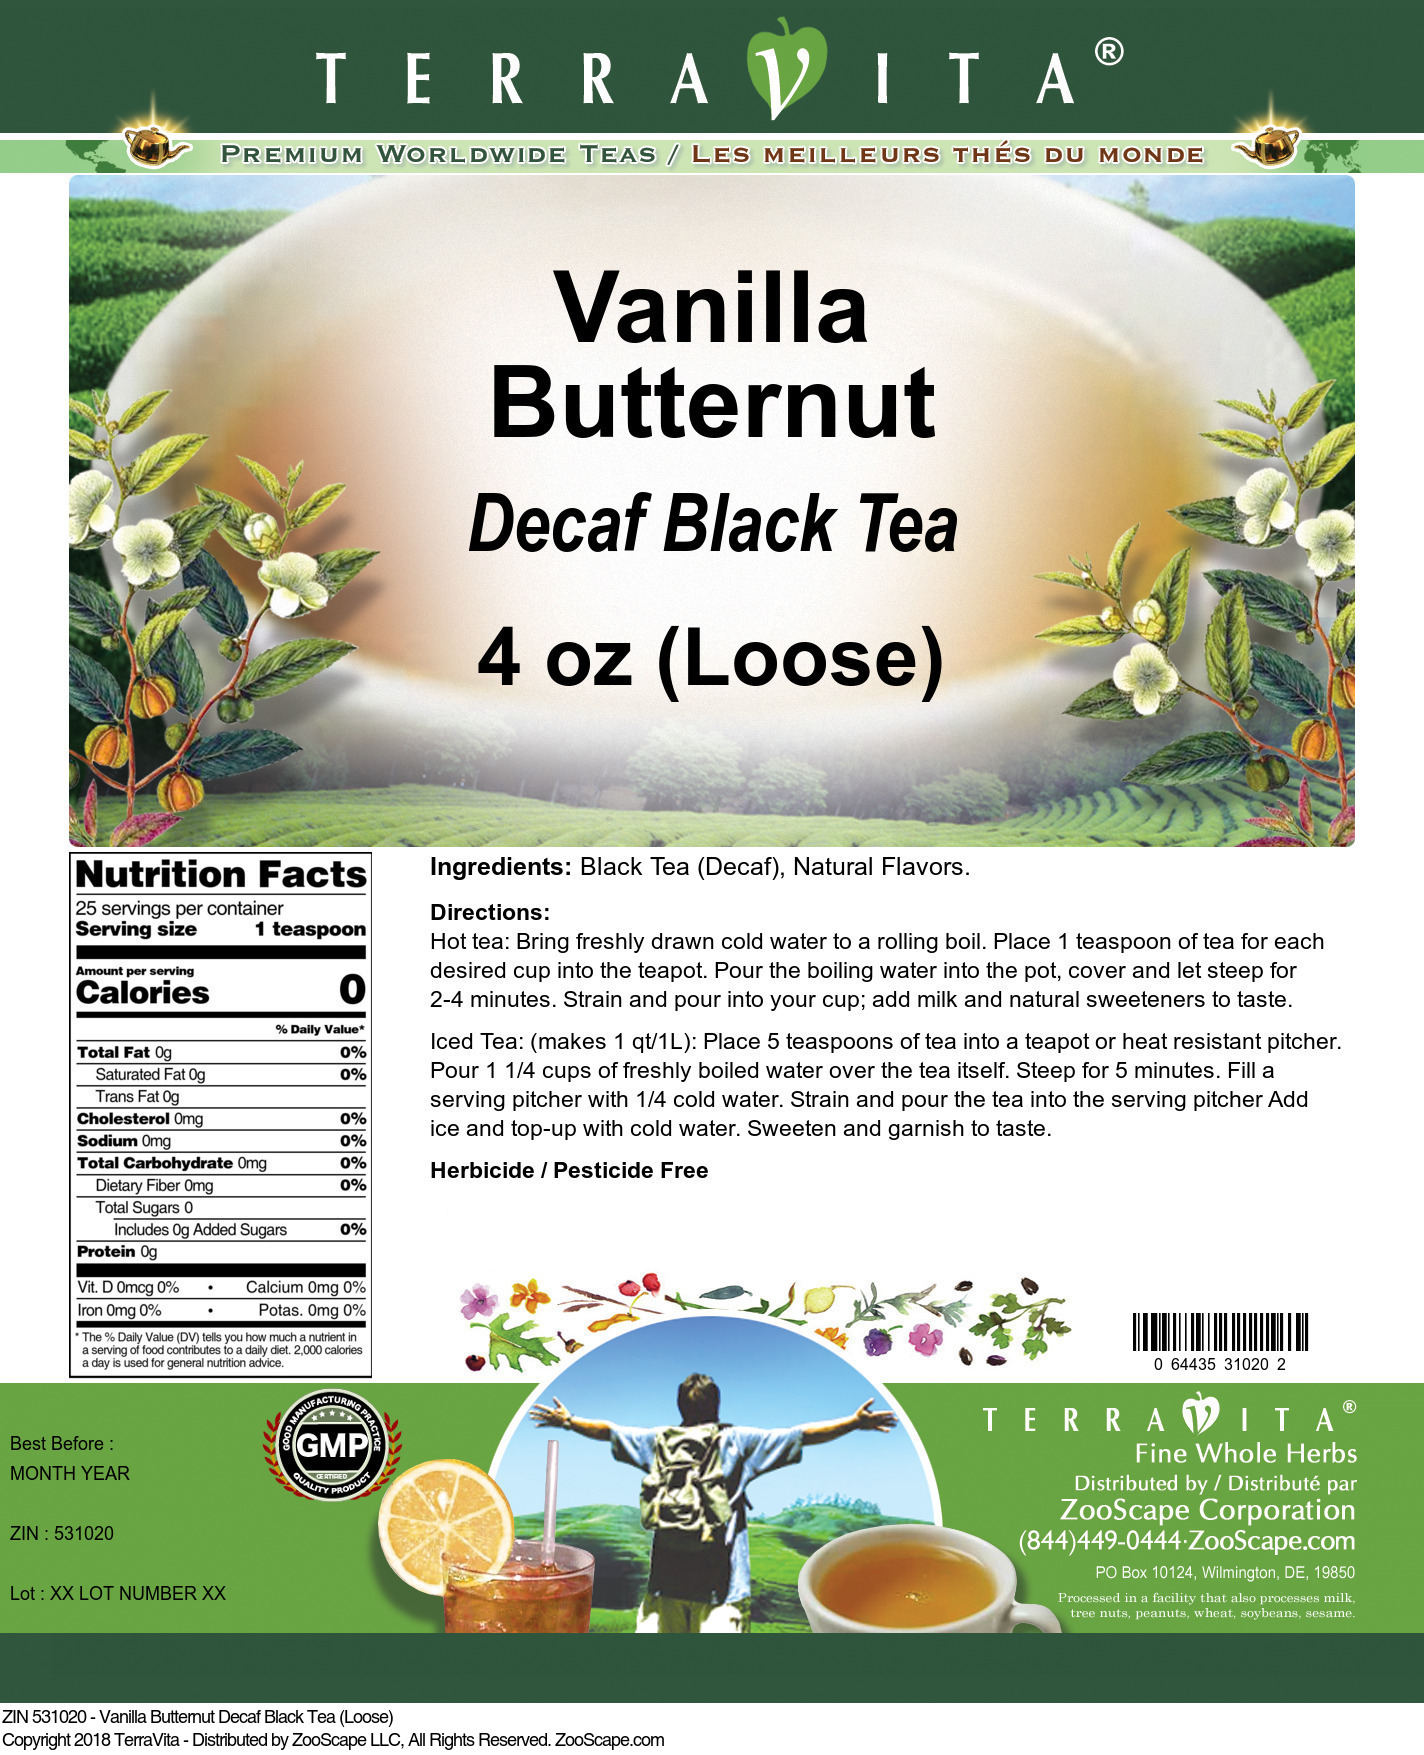 Vanilla Butternut Decaf Black Tea